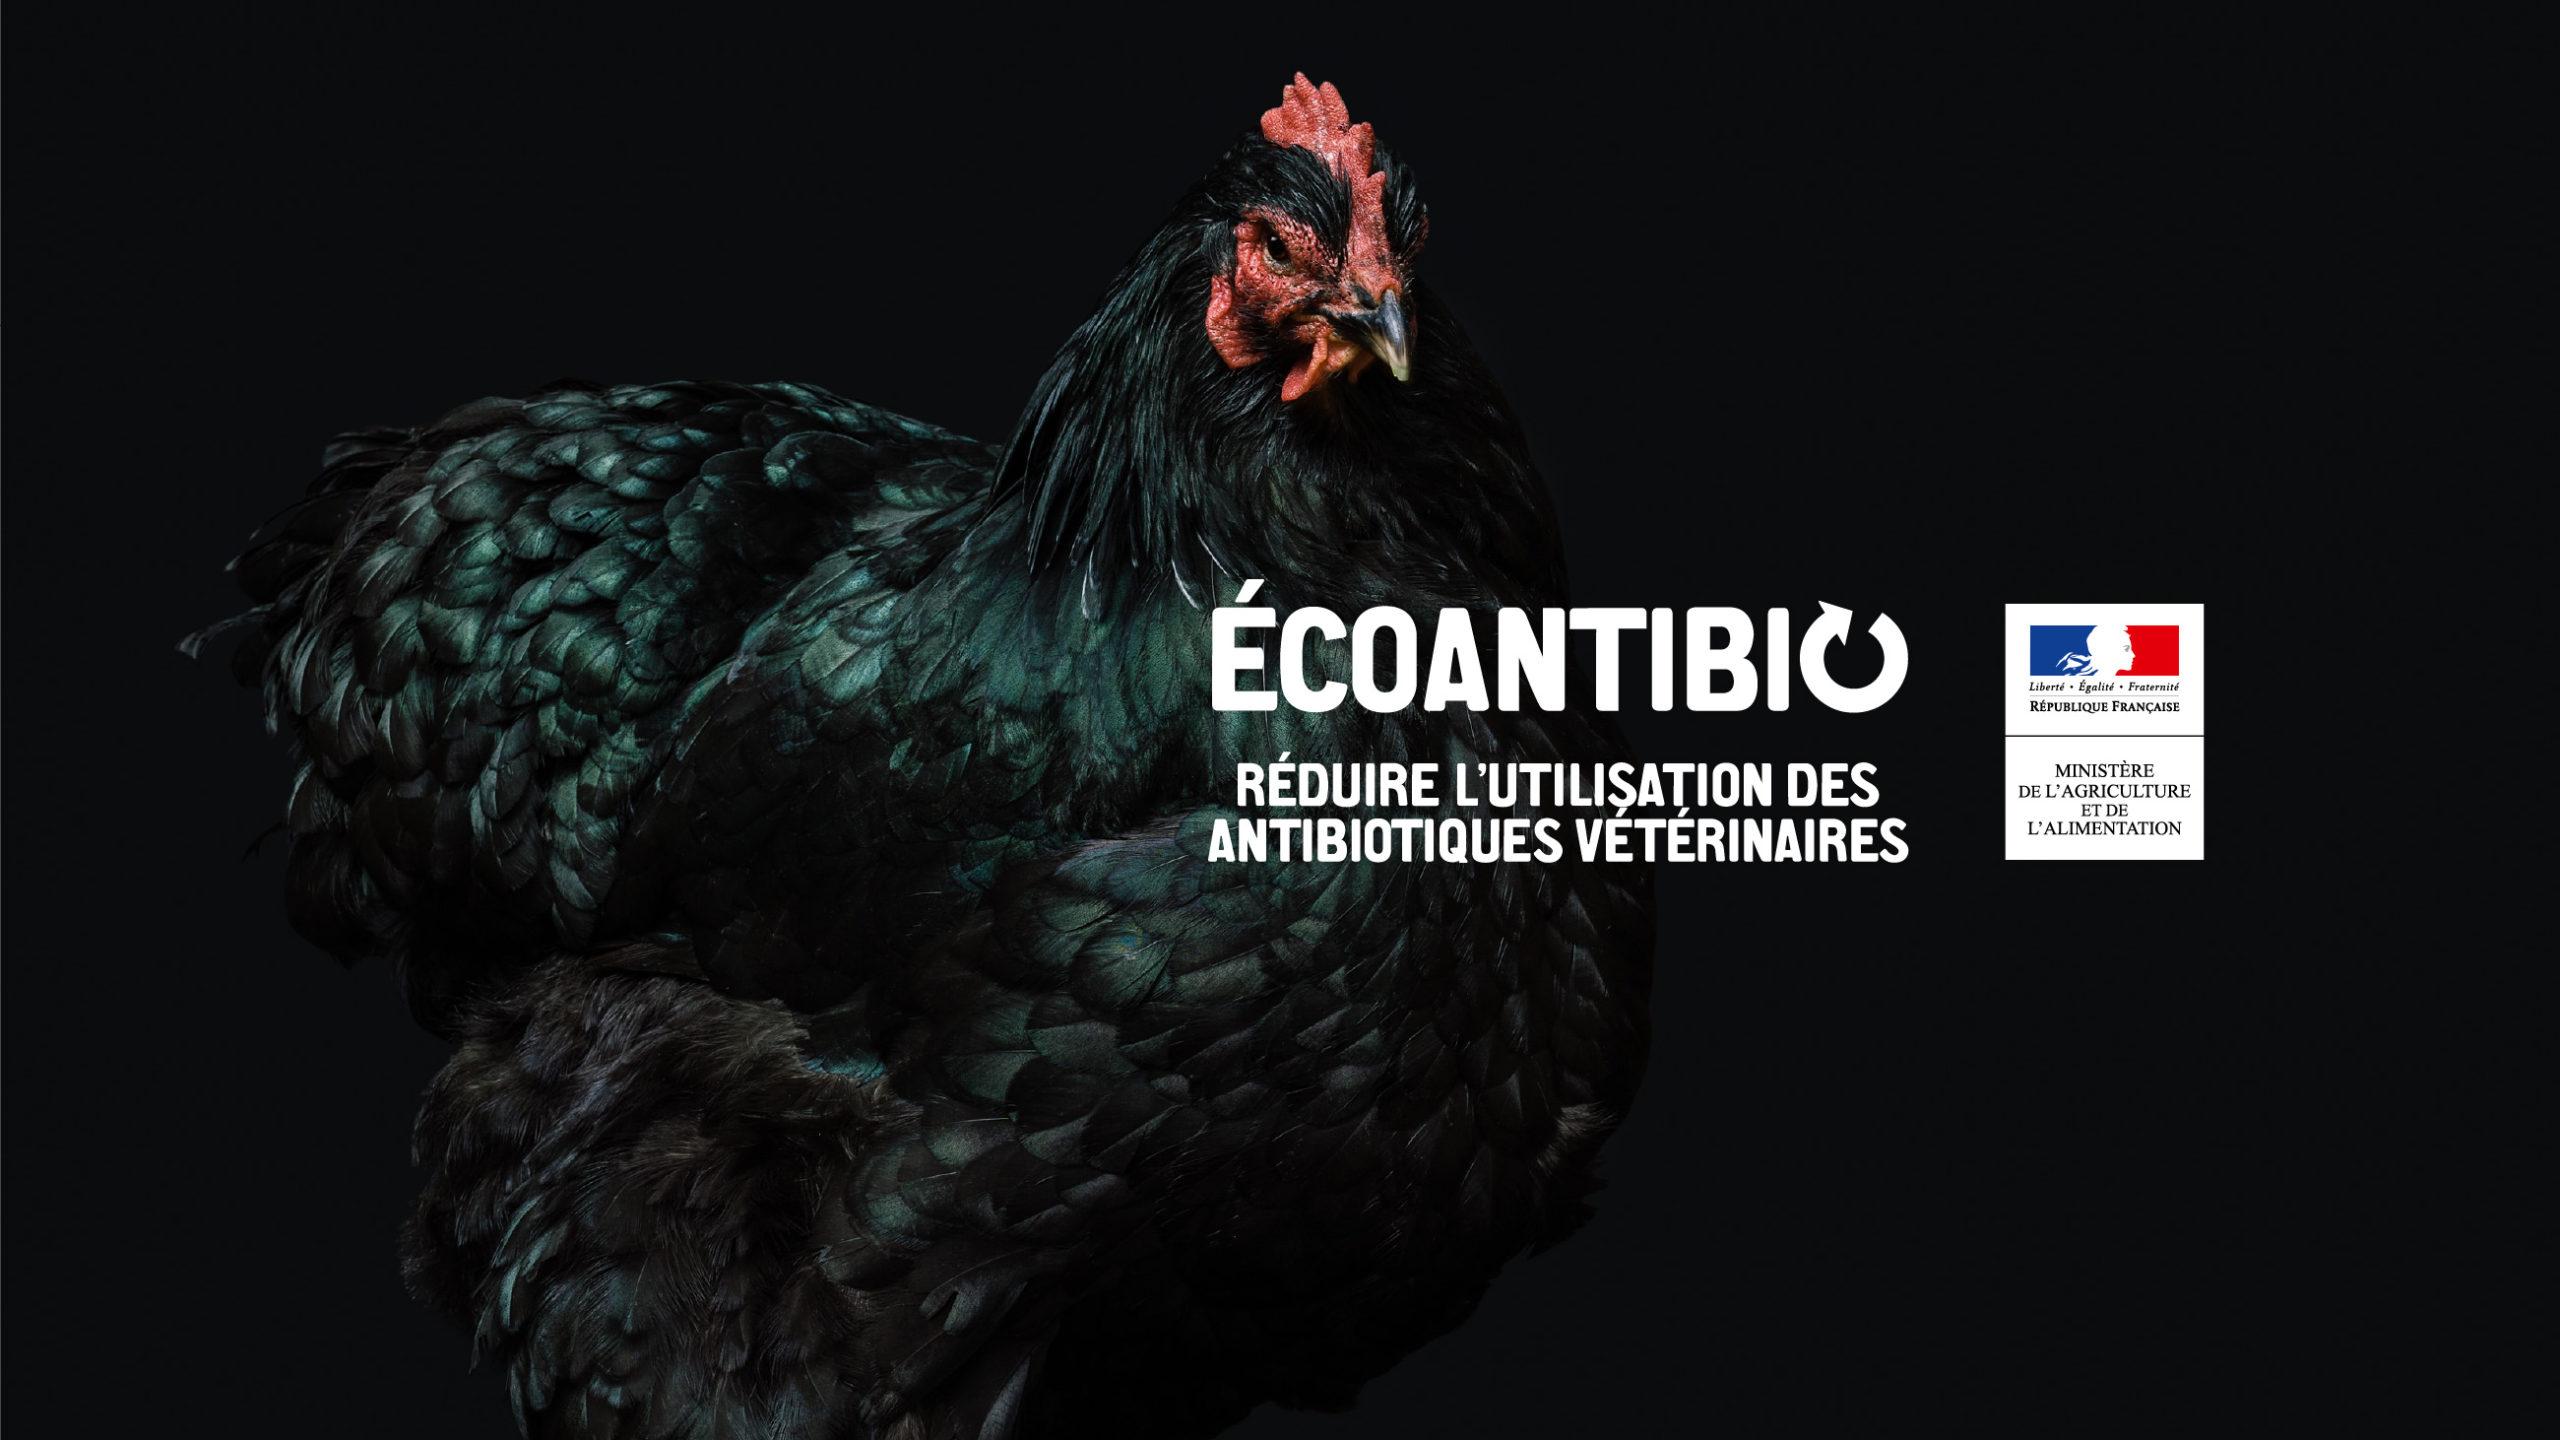 poster-ecoantibio-poule